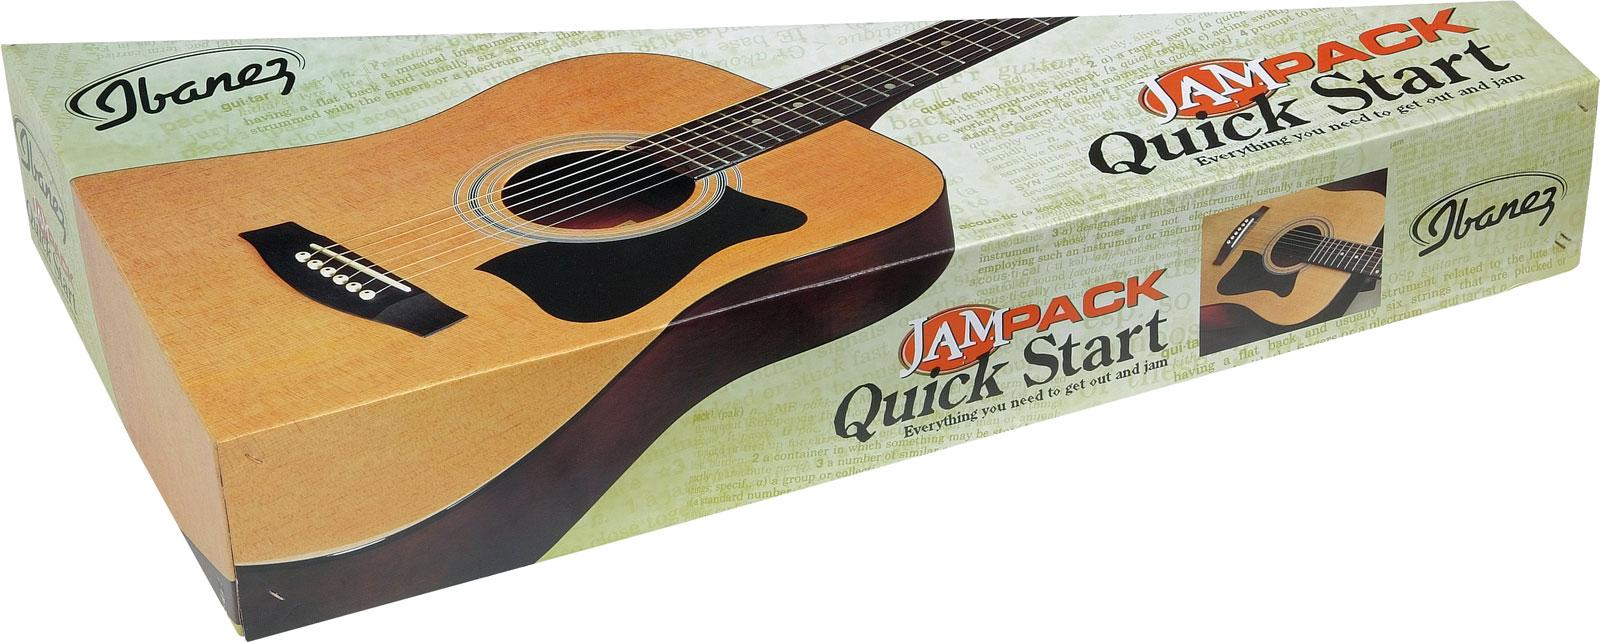 Ibanez Gaucher V50lnjp Nt Jam Pack Natural Kit + Accessoires